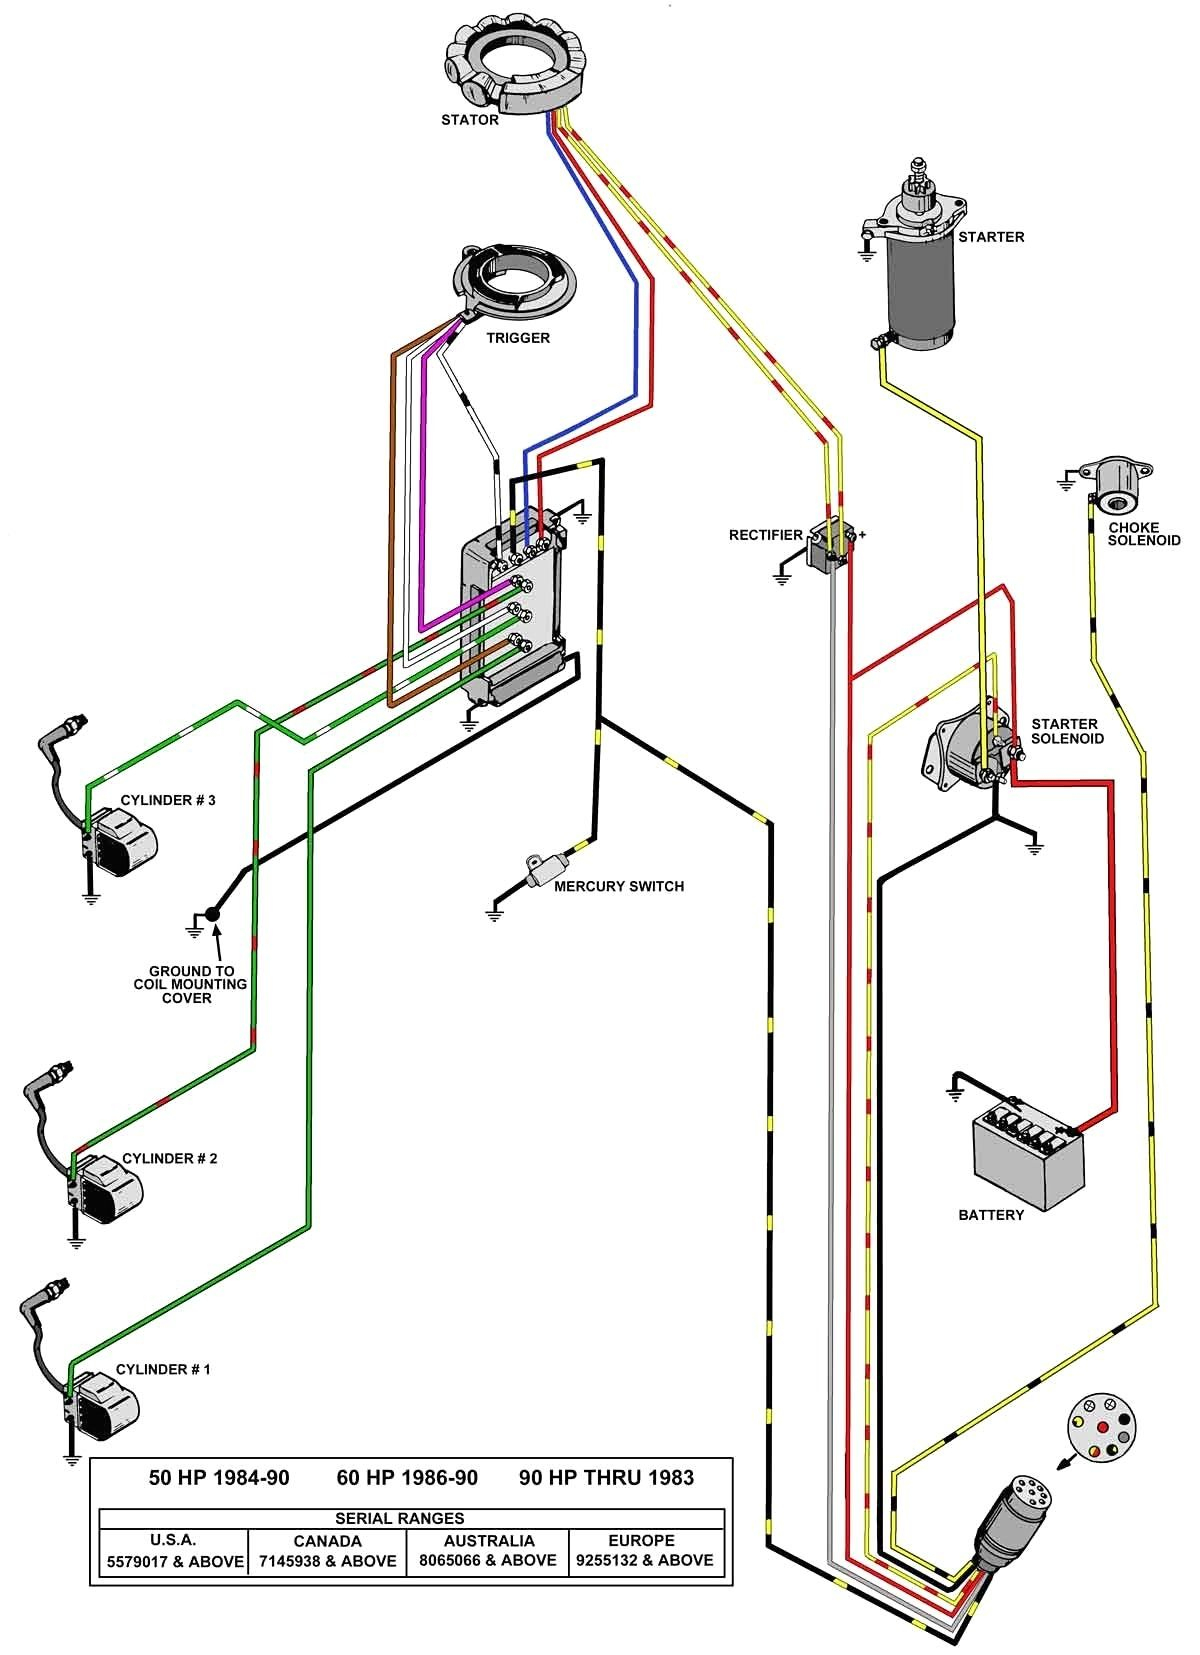 Mercury Marine Ignition Switch Wiring Diagram | Wiringdiagram - Mercury Outboard Wiring Diagram Ignition Switch